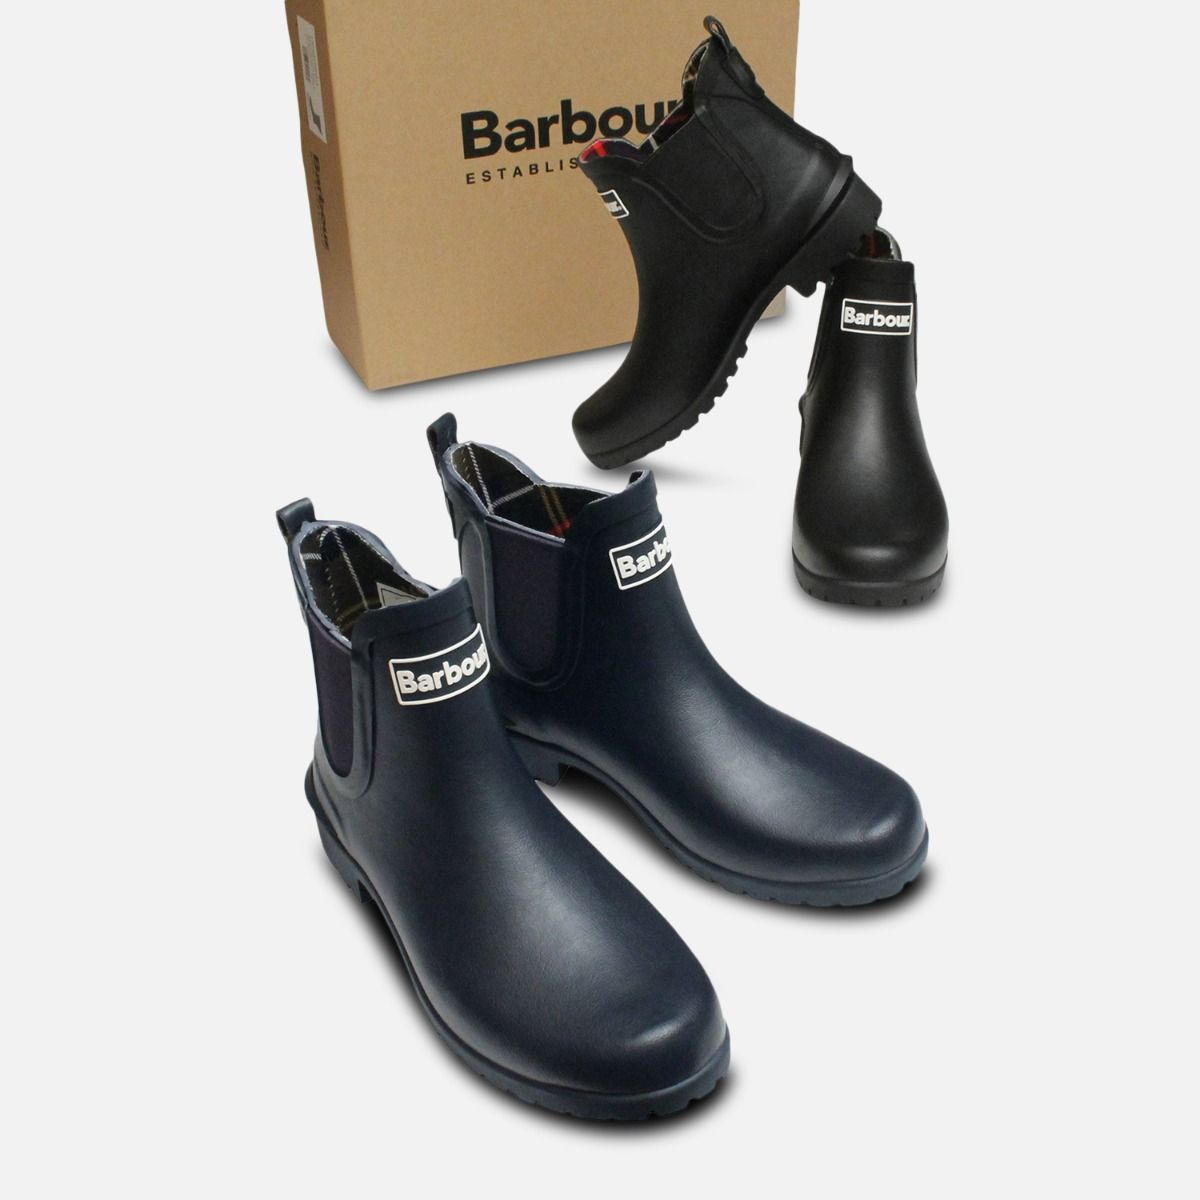 Barbour Ladies Wilton Chelsea Boot Wellies in Black